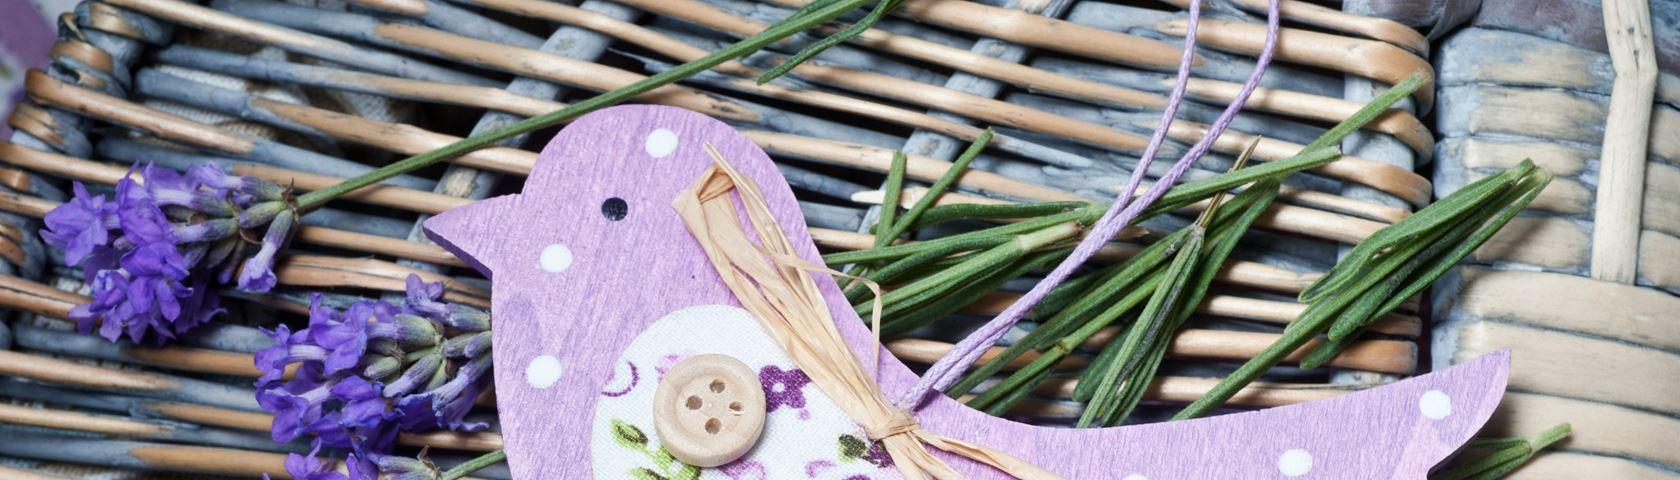 Lavender Creation